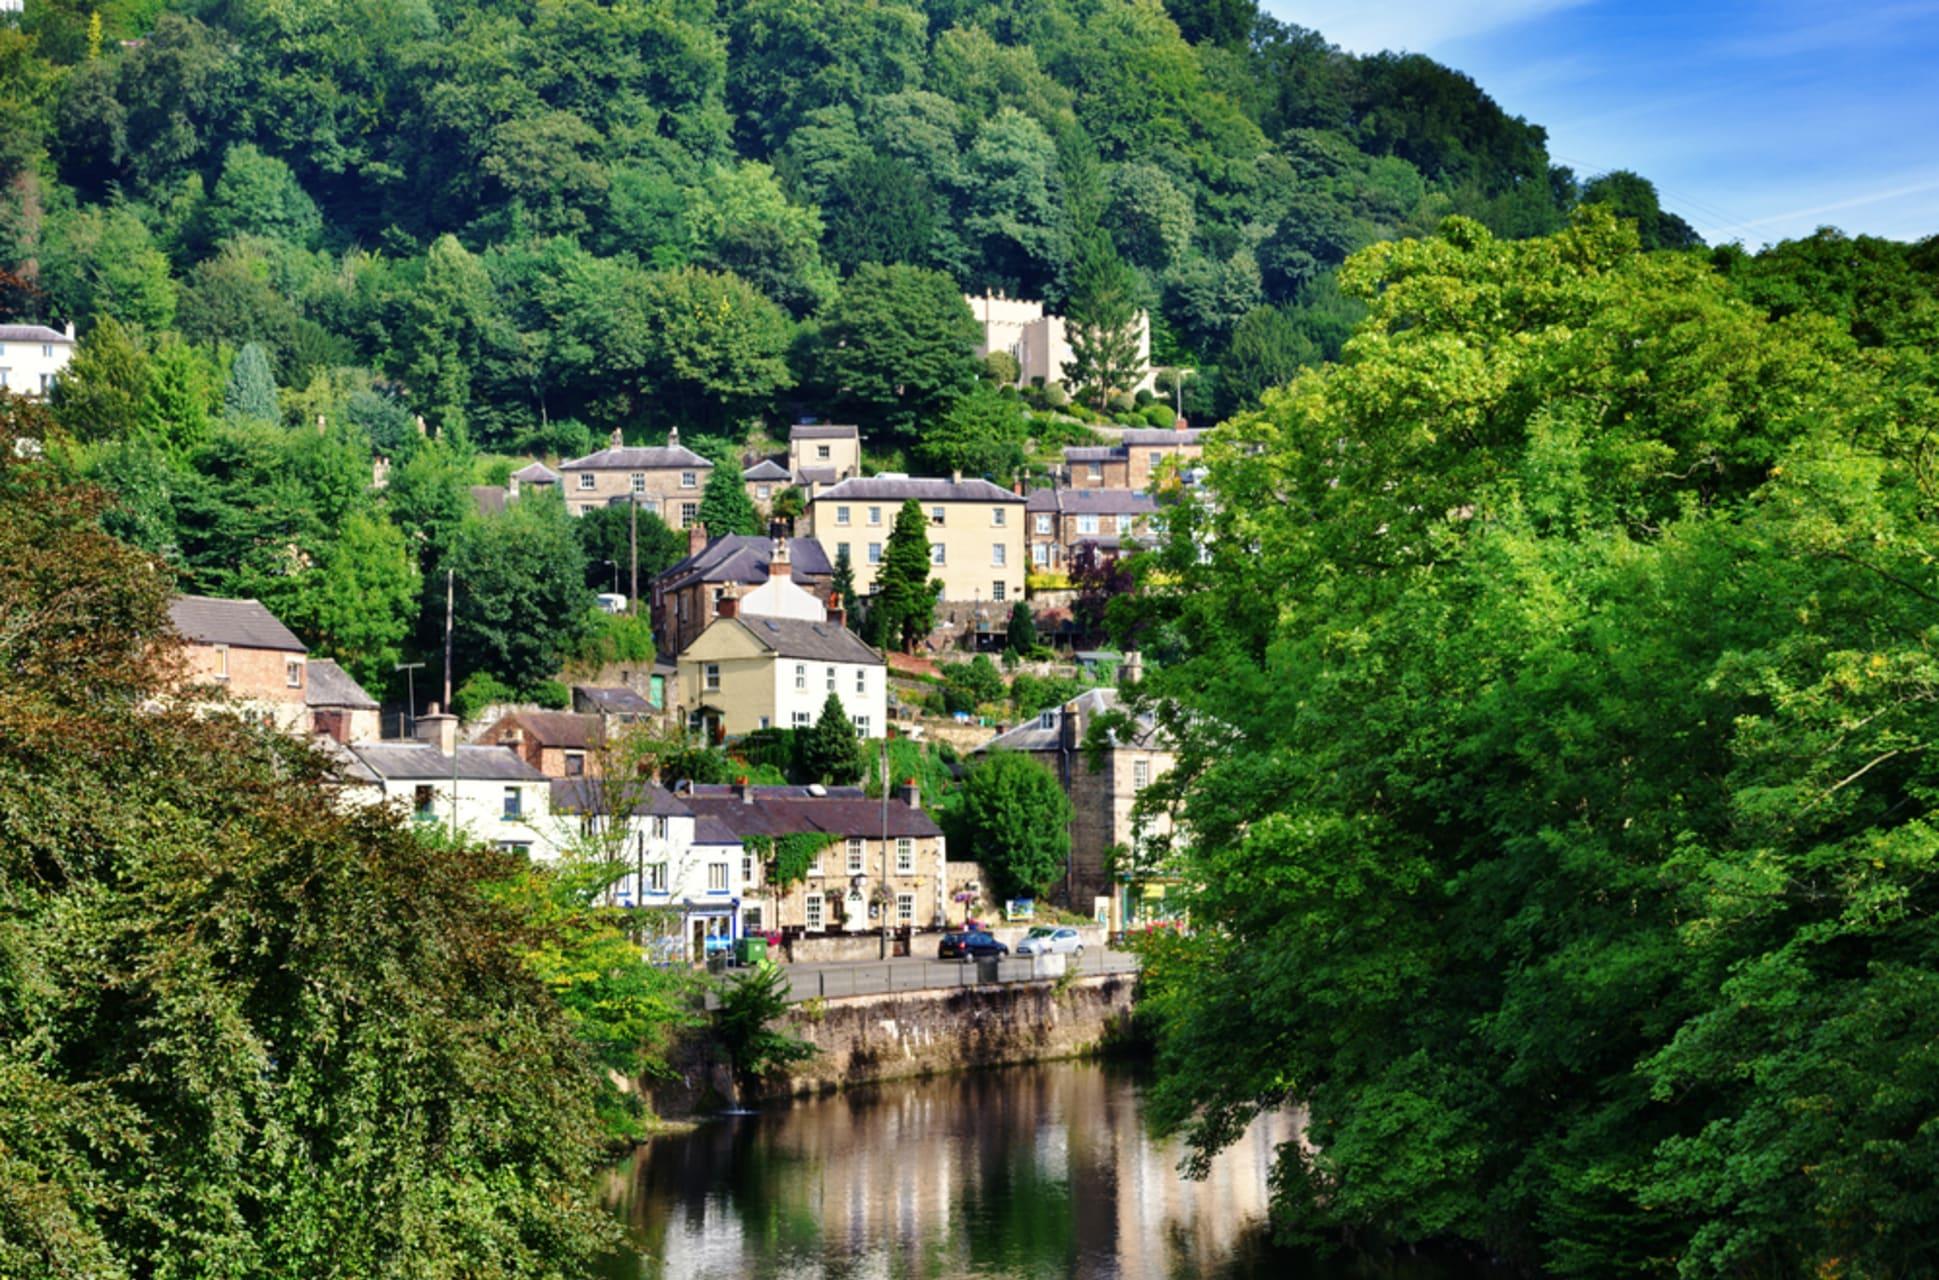 Peak District - Matlock Bath - English Riverside Resort